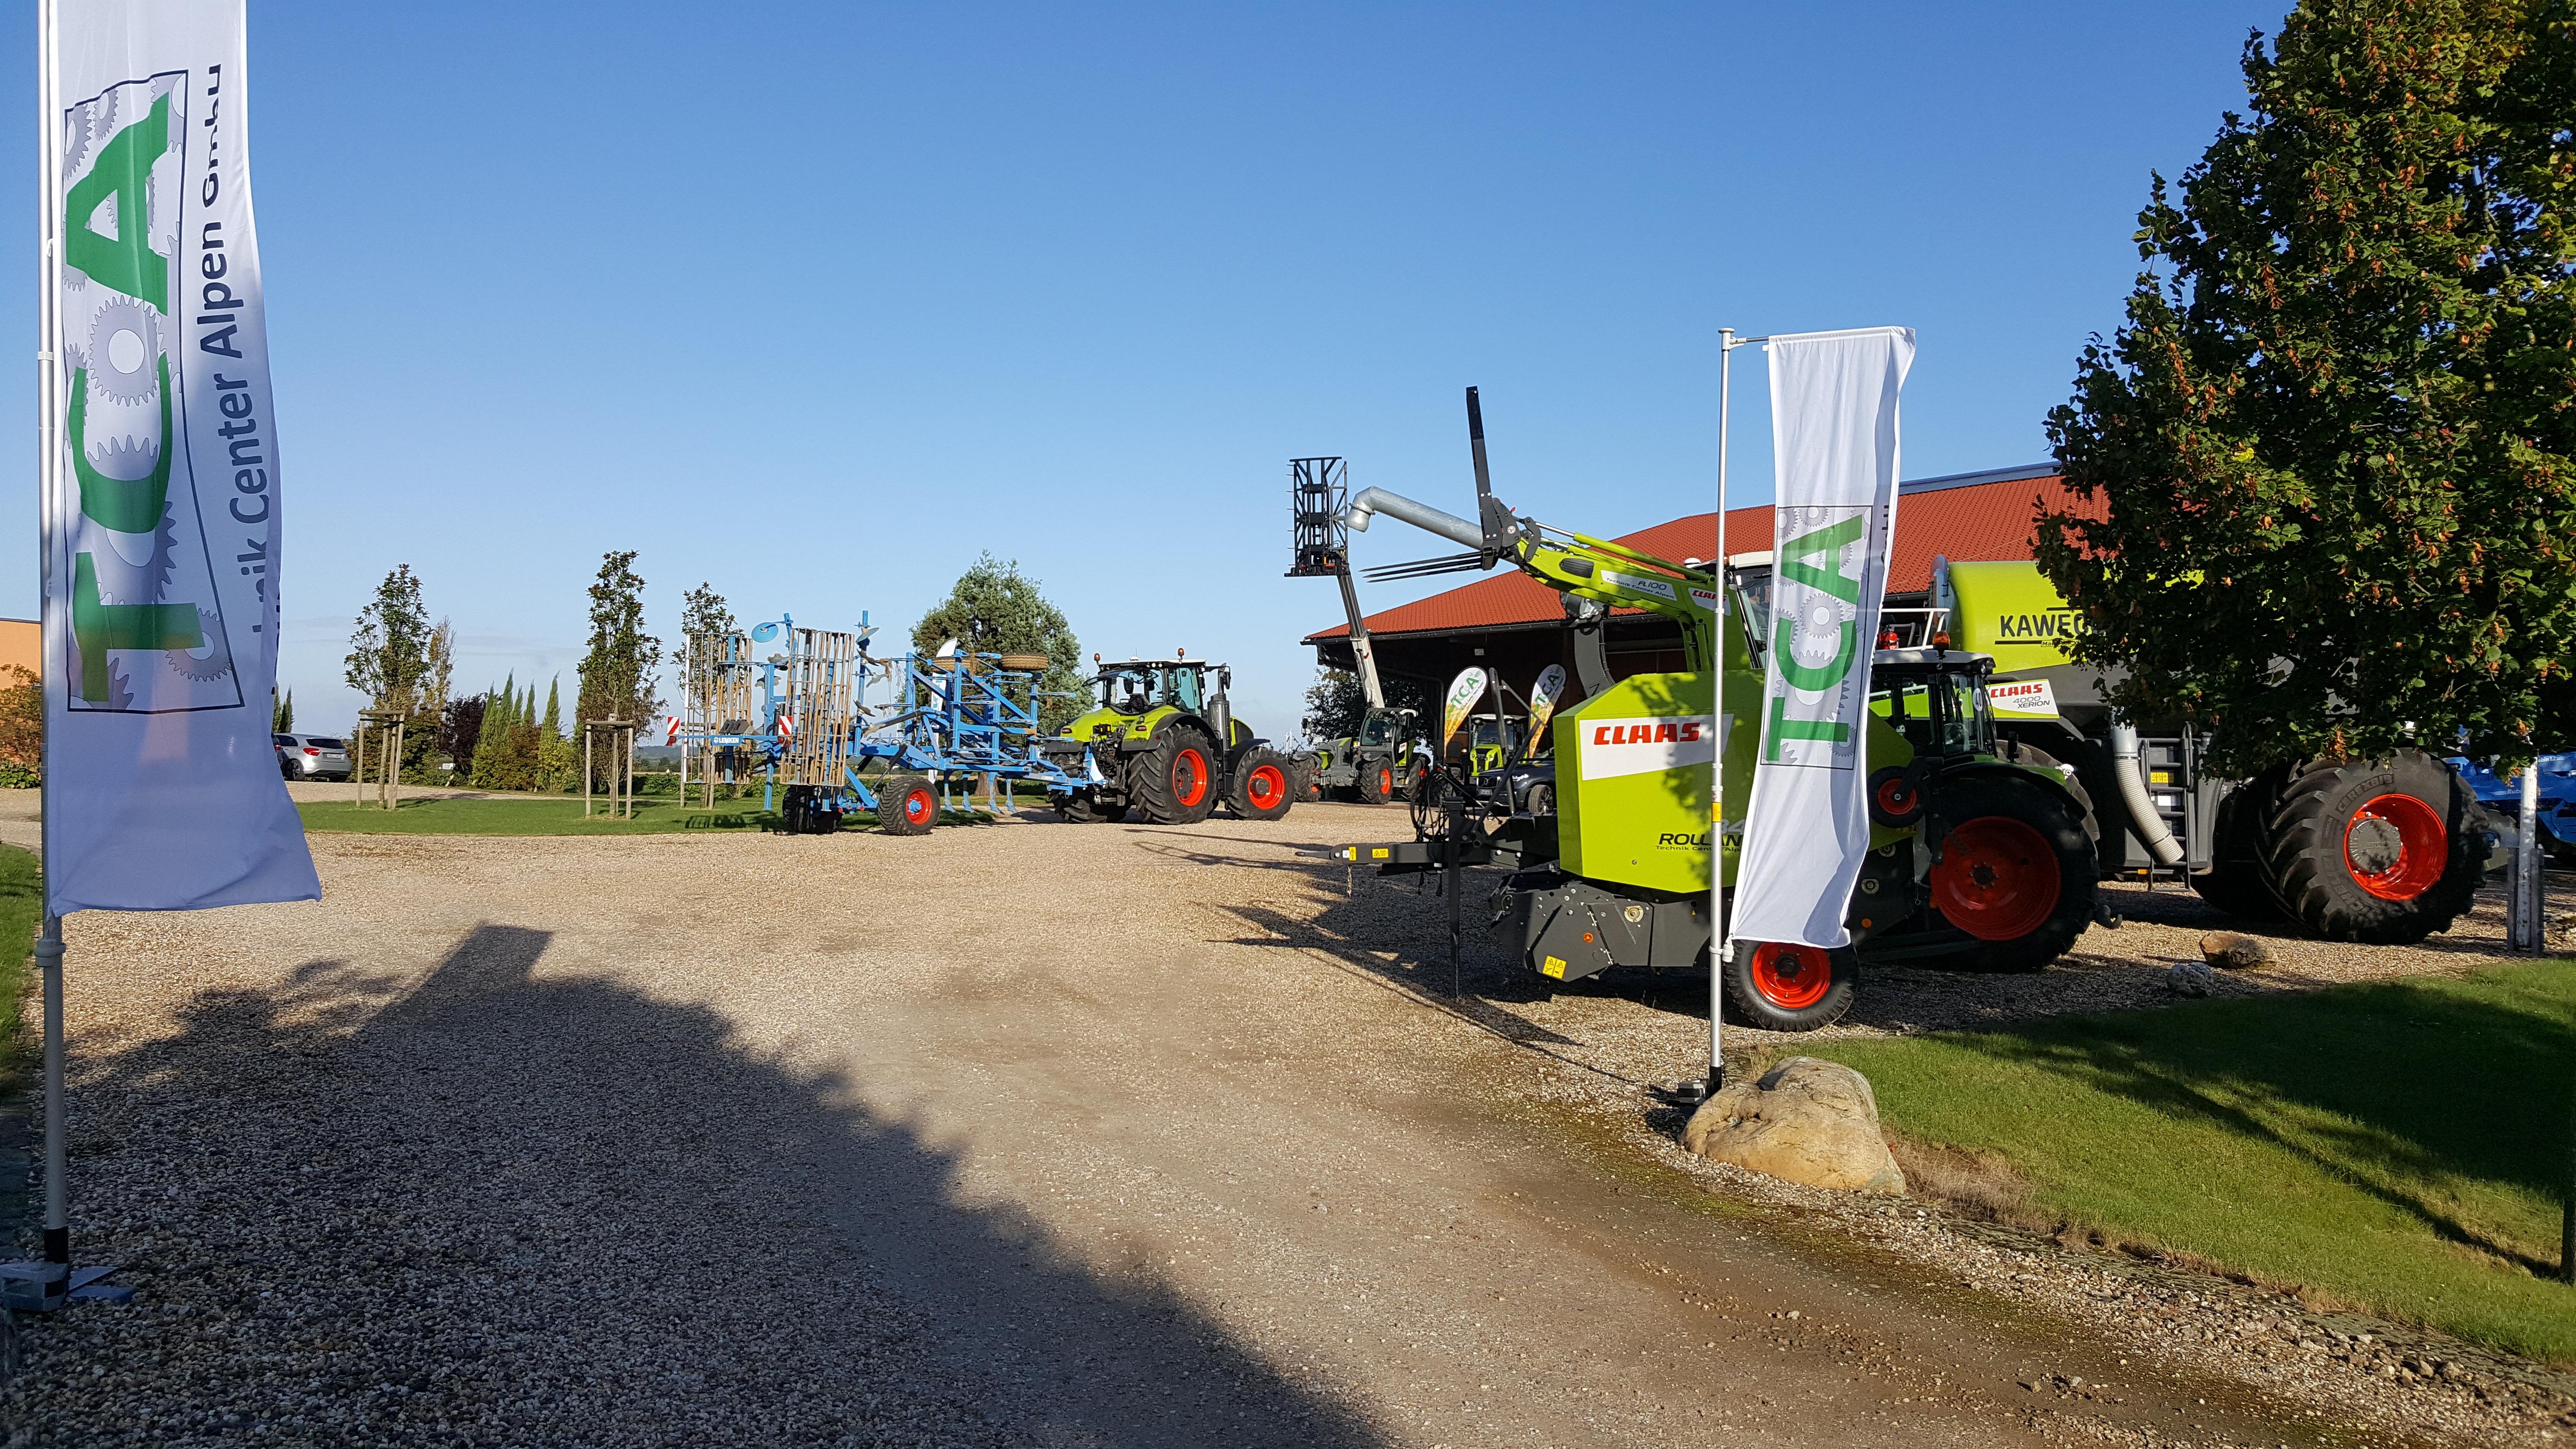 Traktorencamp in Bergheim